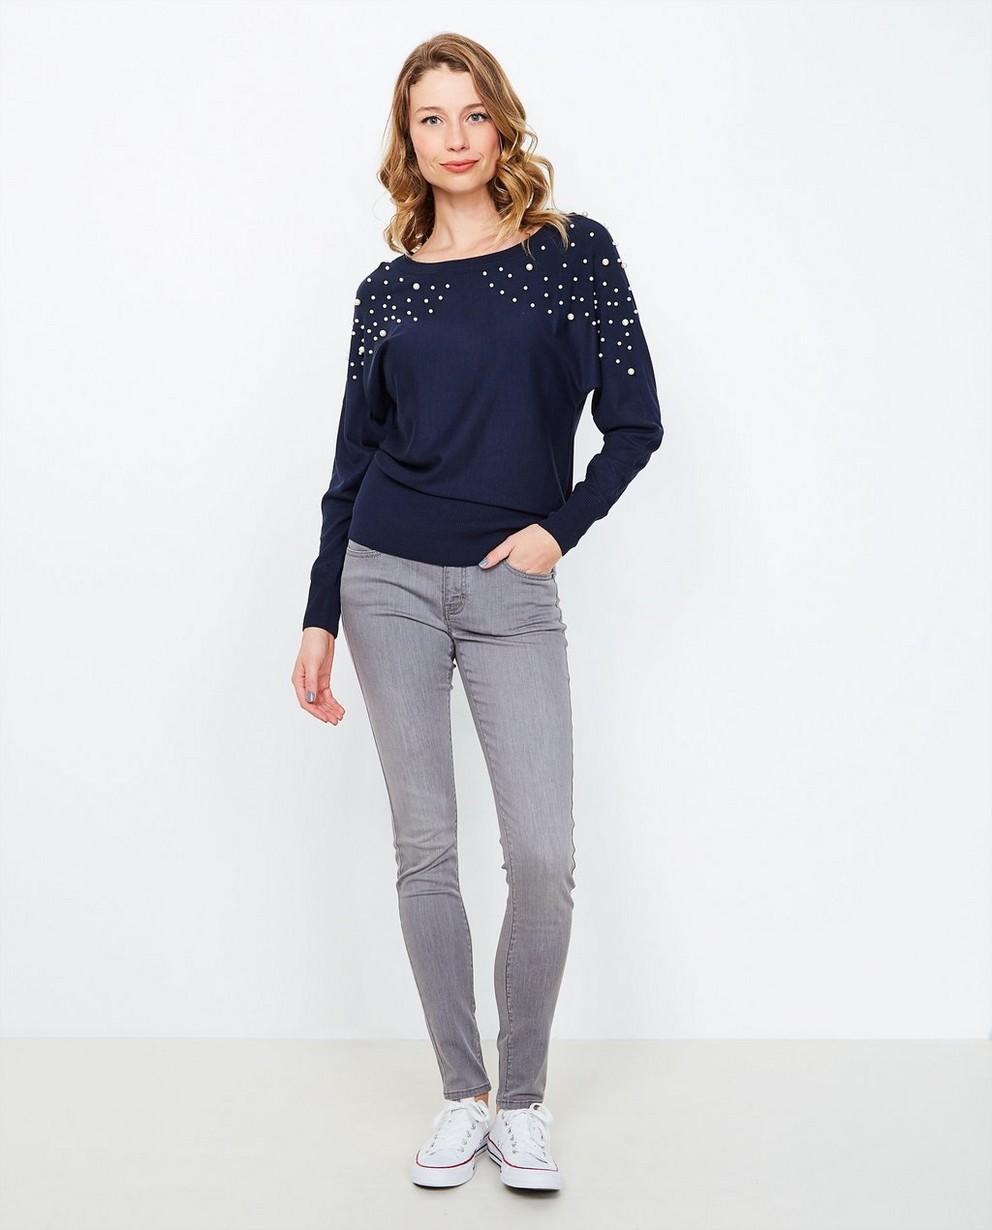 Jeans - grey - Grijze skinny jeans